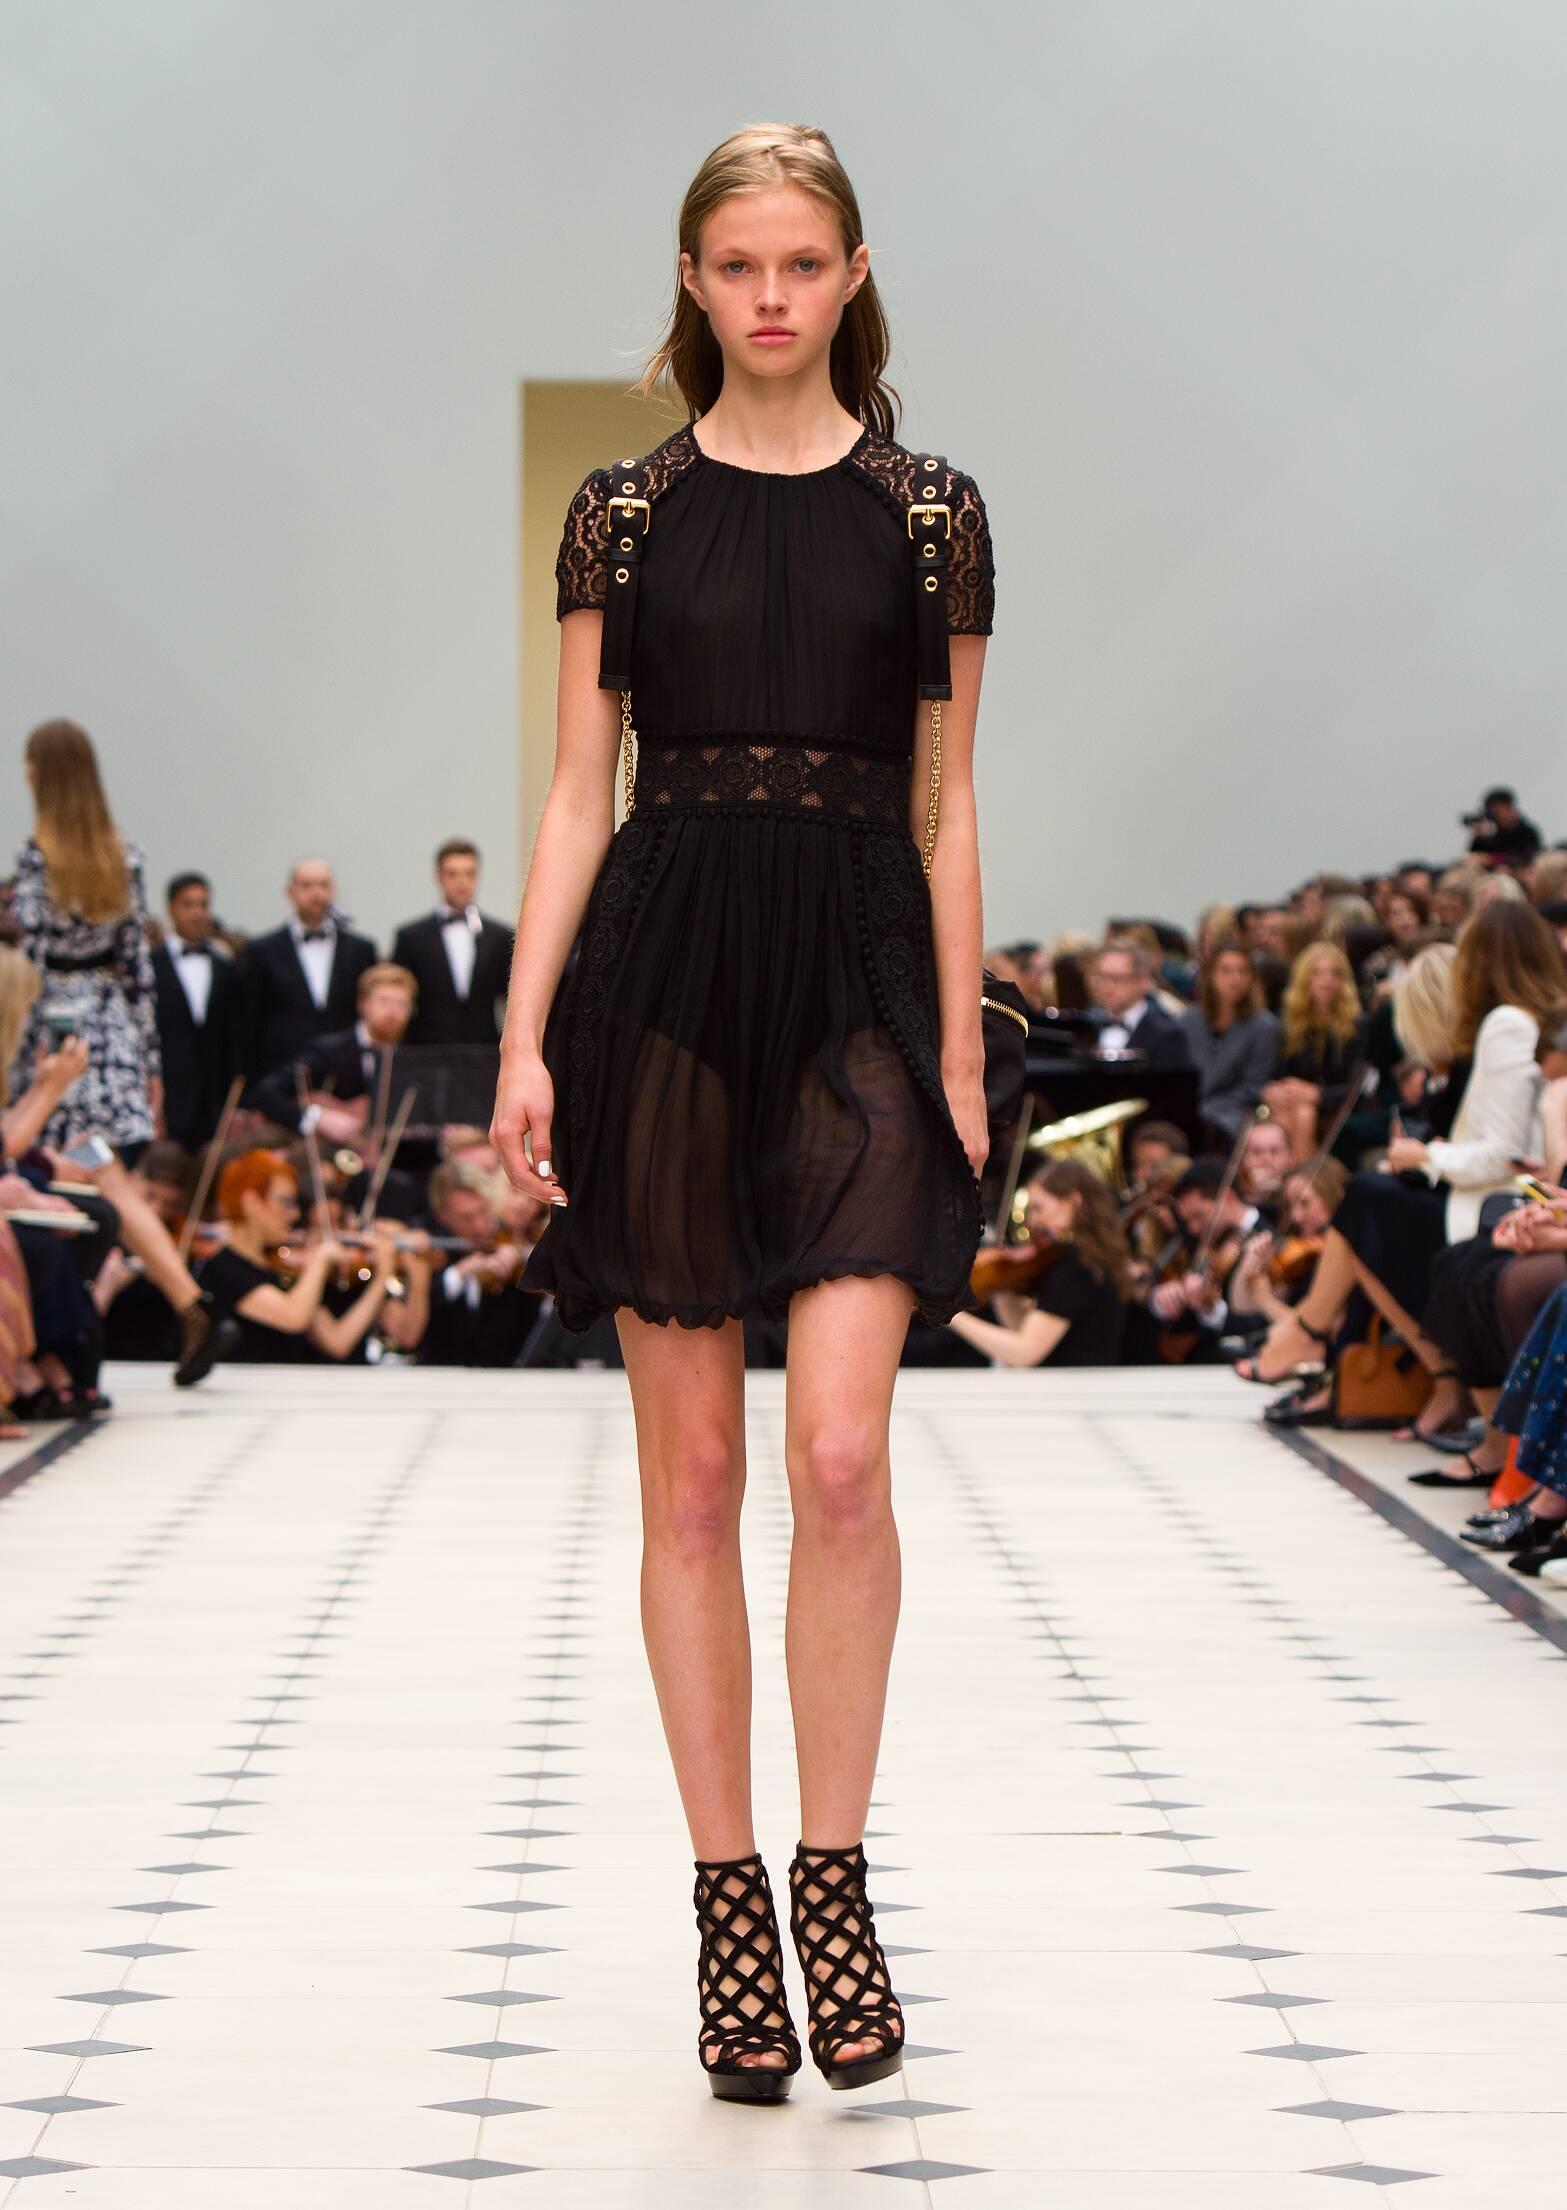 Catwalk Burberry Prorsum Woman Fashion Show Summer 2016